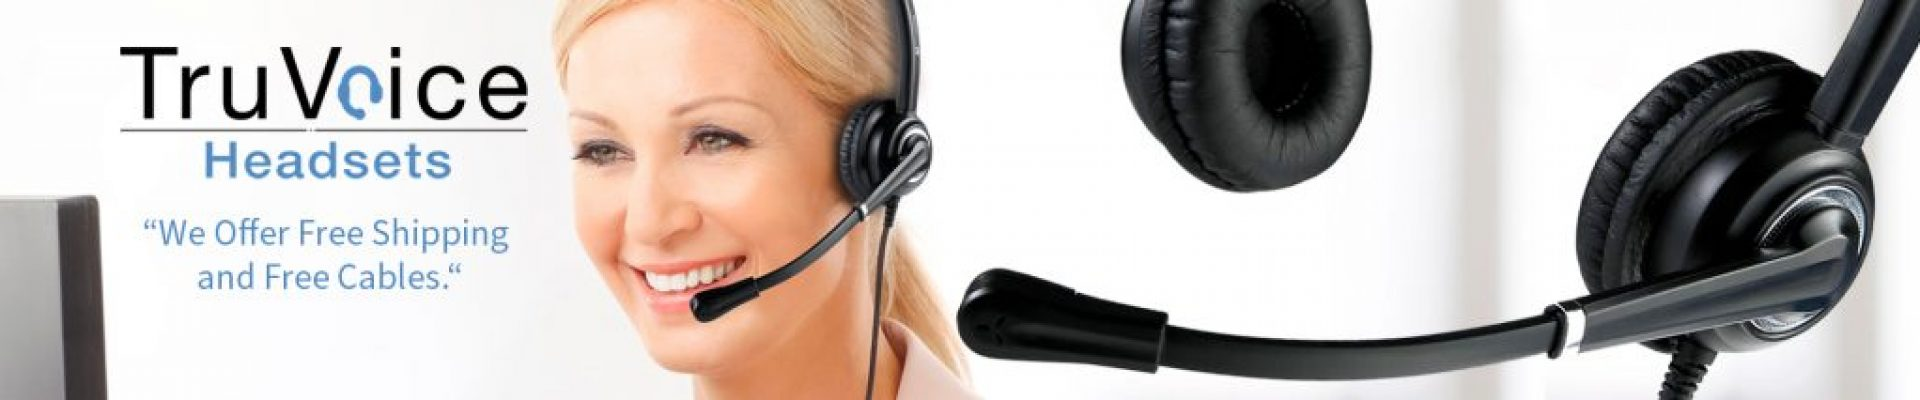 tuvoice-headsets-imagebar-2b